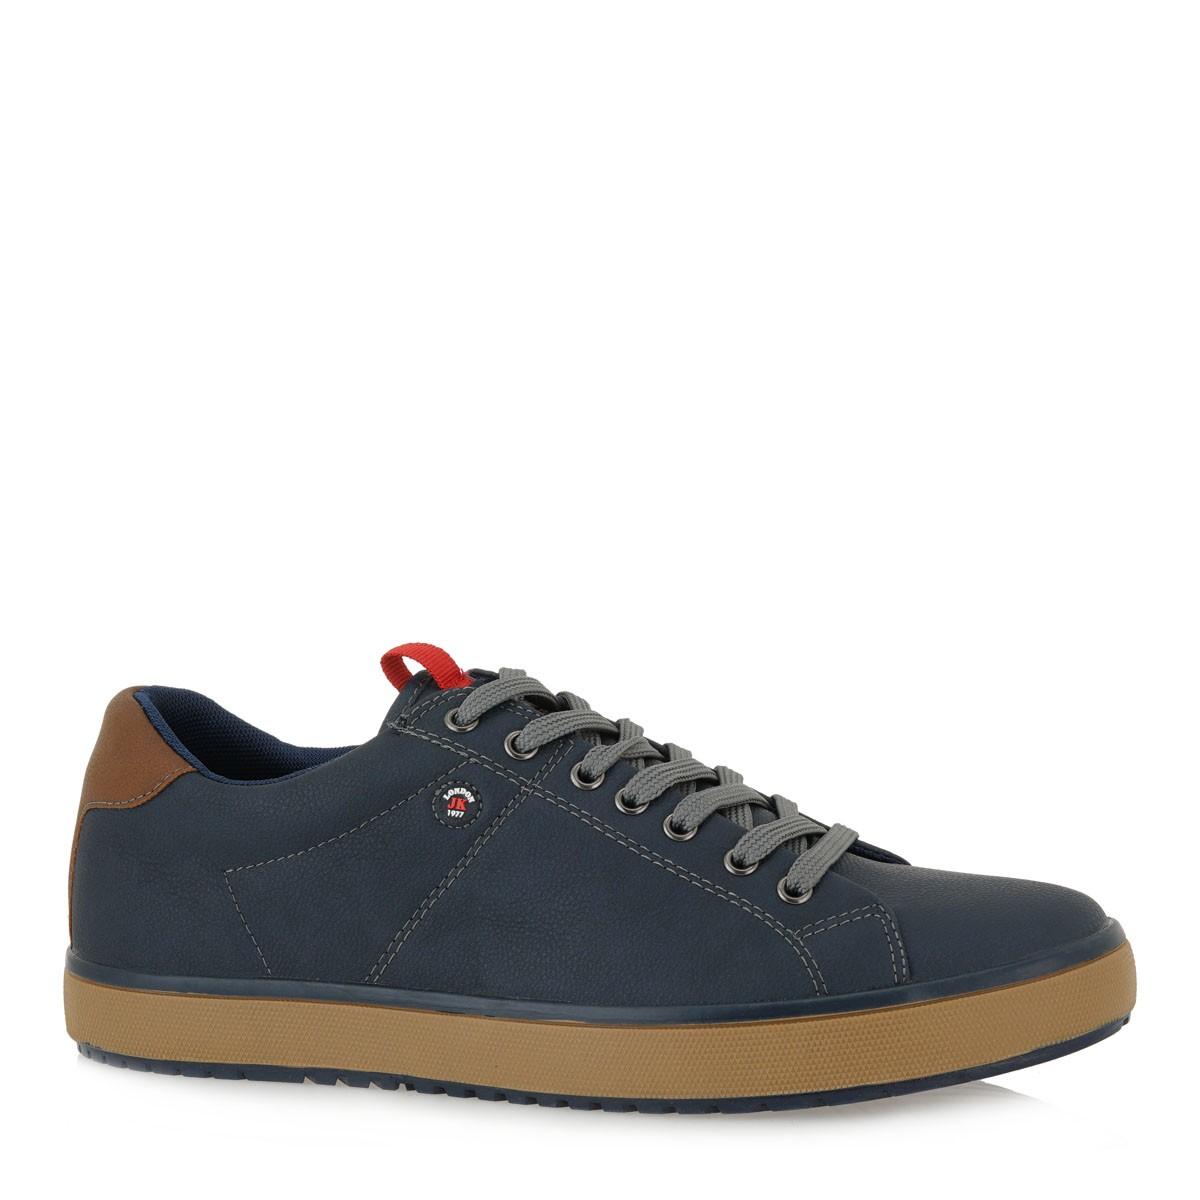 JK LONDON Ανδρικά παπούτσια Sneakers 268-700 Μπλέ L57002681051